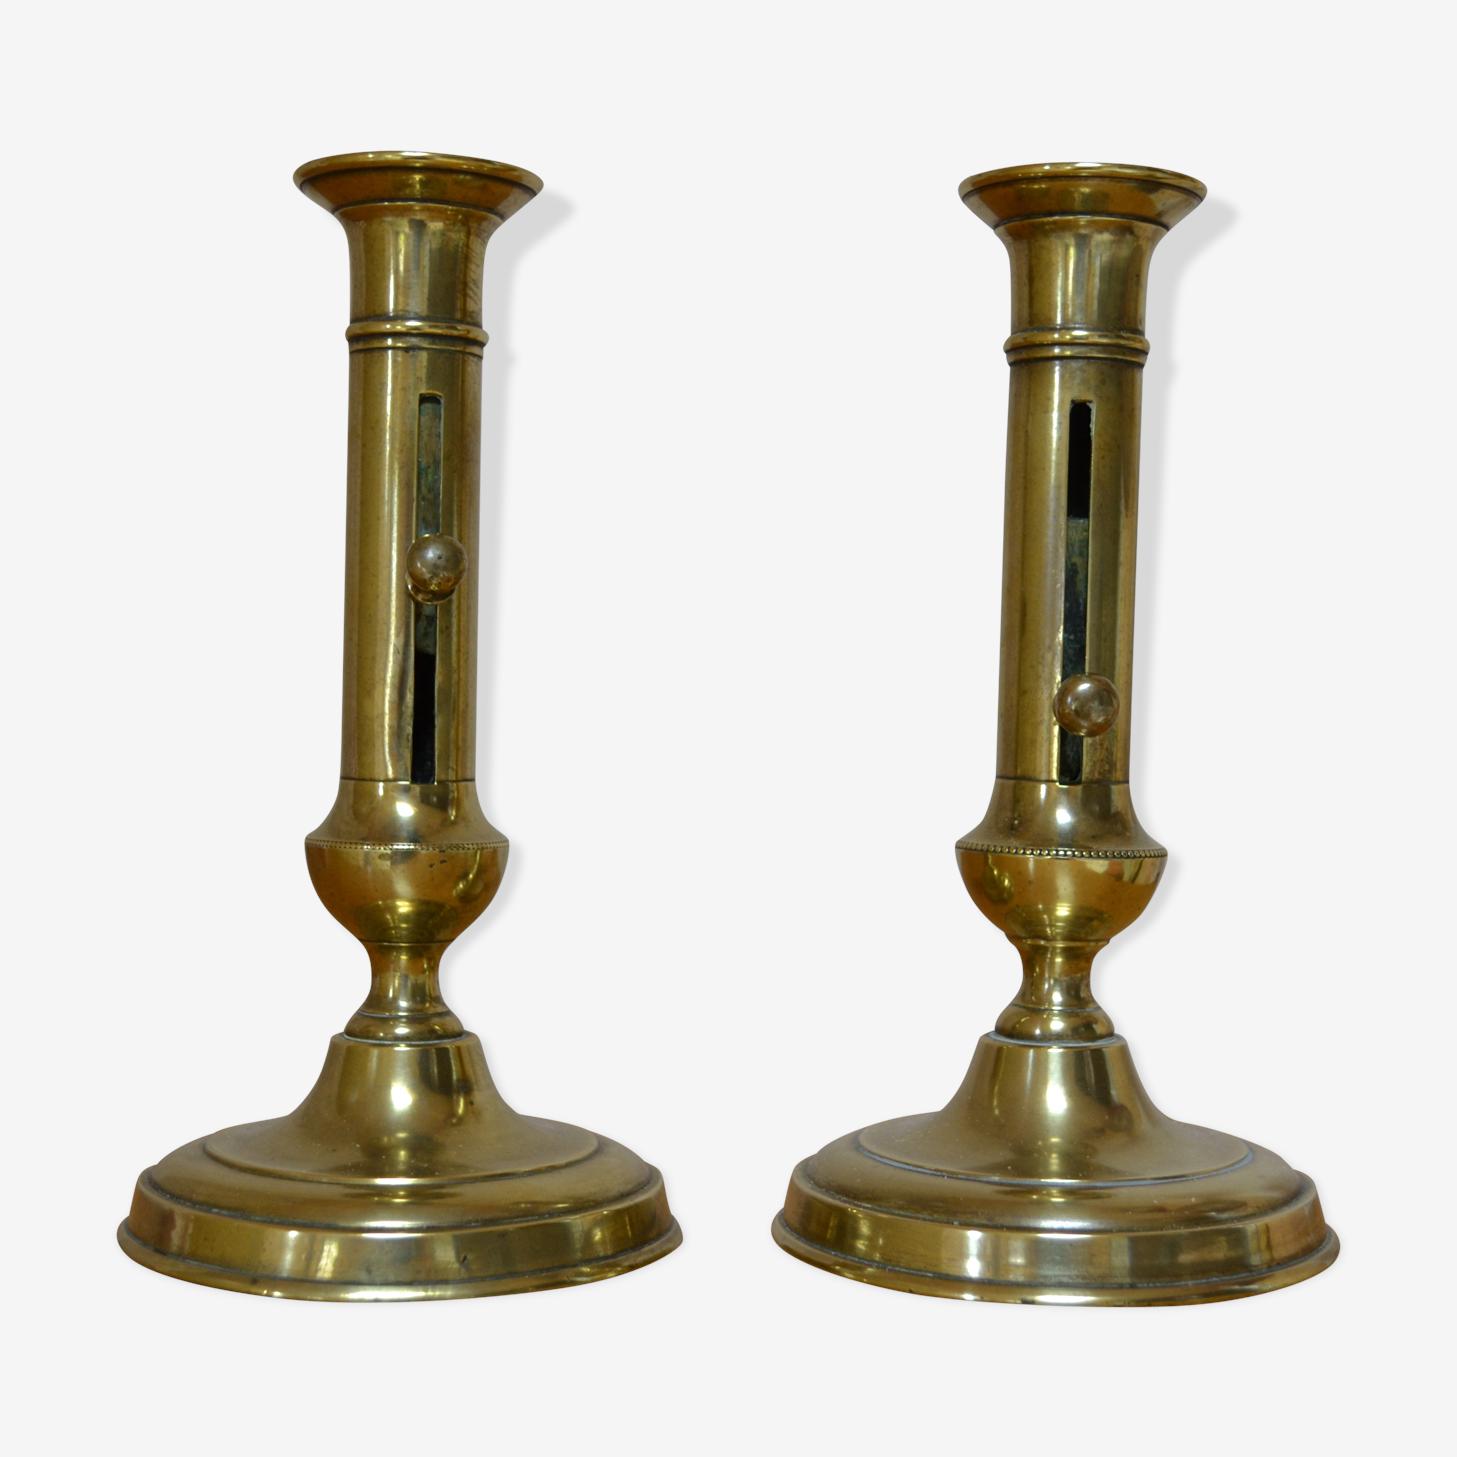 Golden vintage brass candlesticks